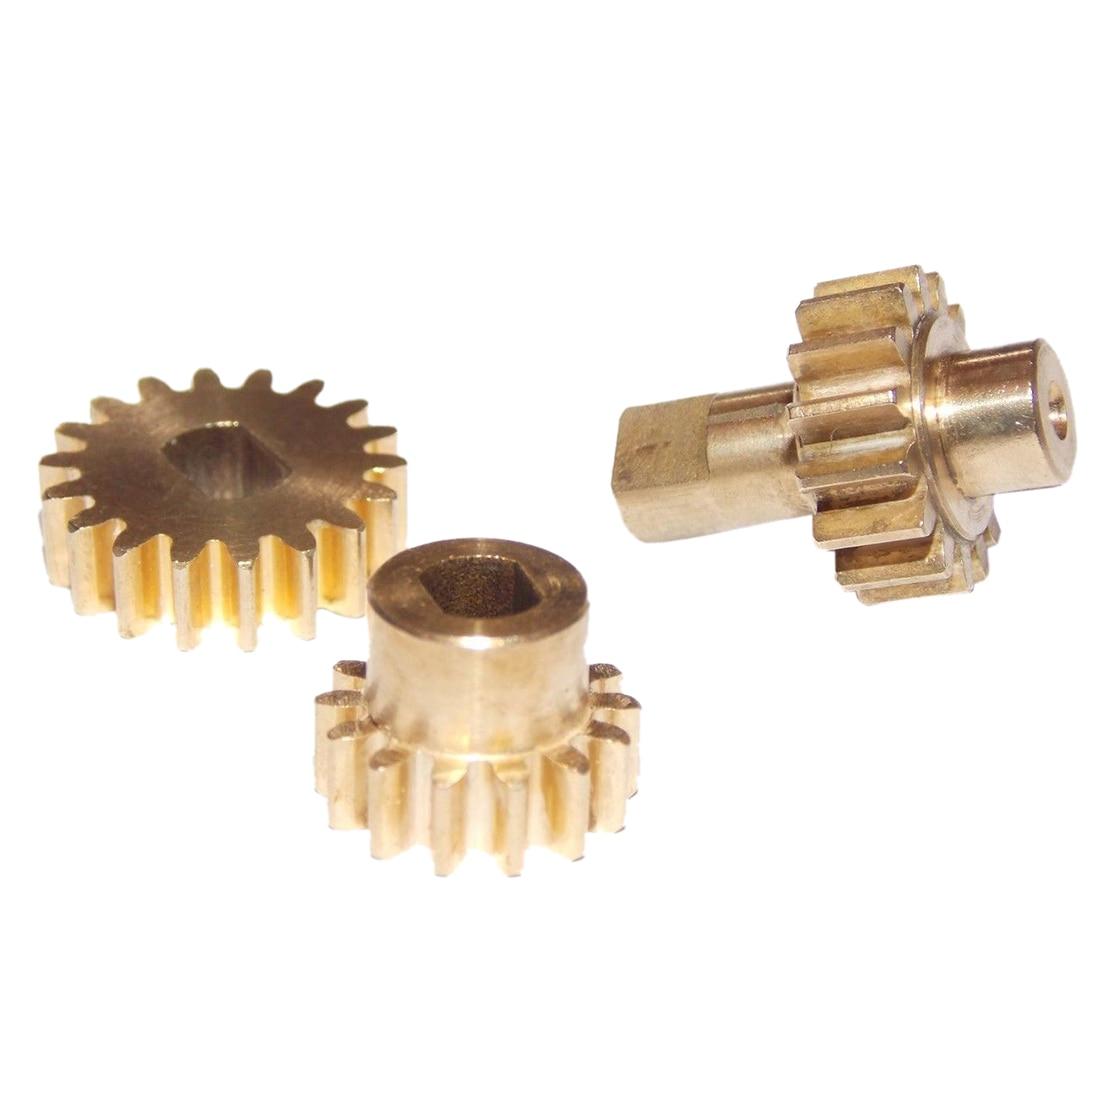 US $8 98 19% OFF|Screen Gears Repair Kit 3 pcs For Audi A8 MMI Mechanism  4E0857273D on Aliexpress com | Alibaba Group